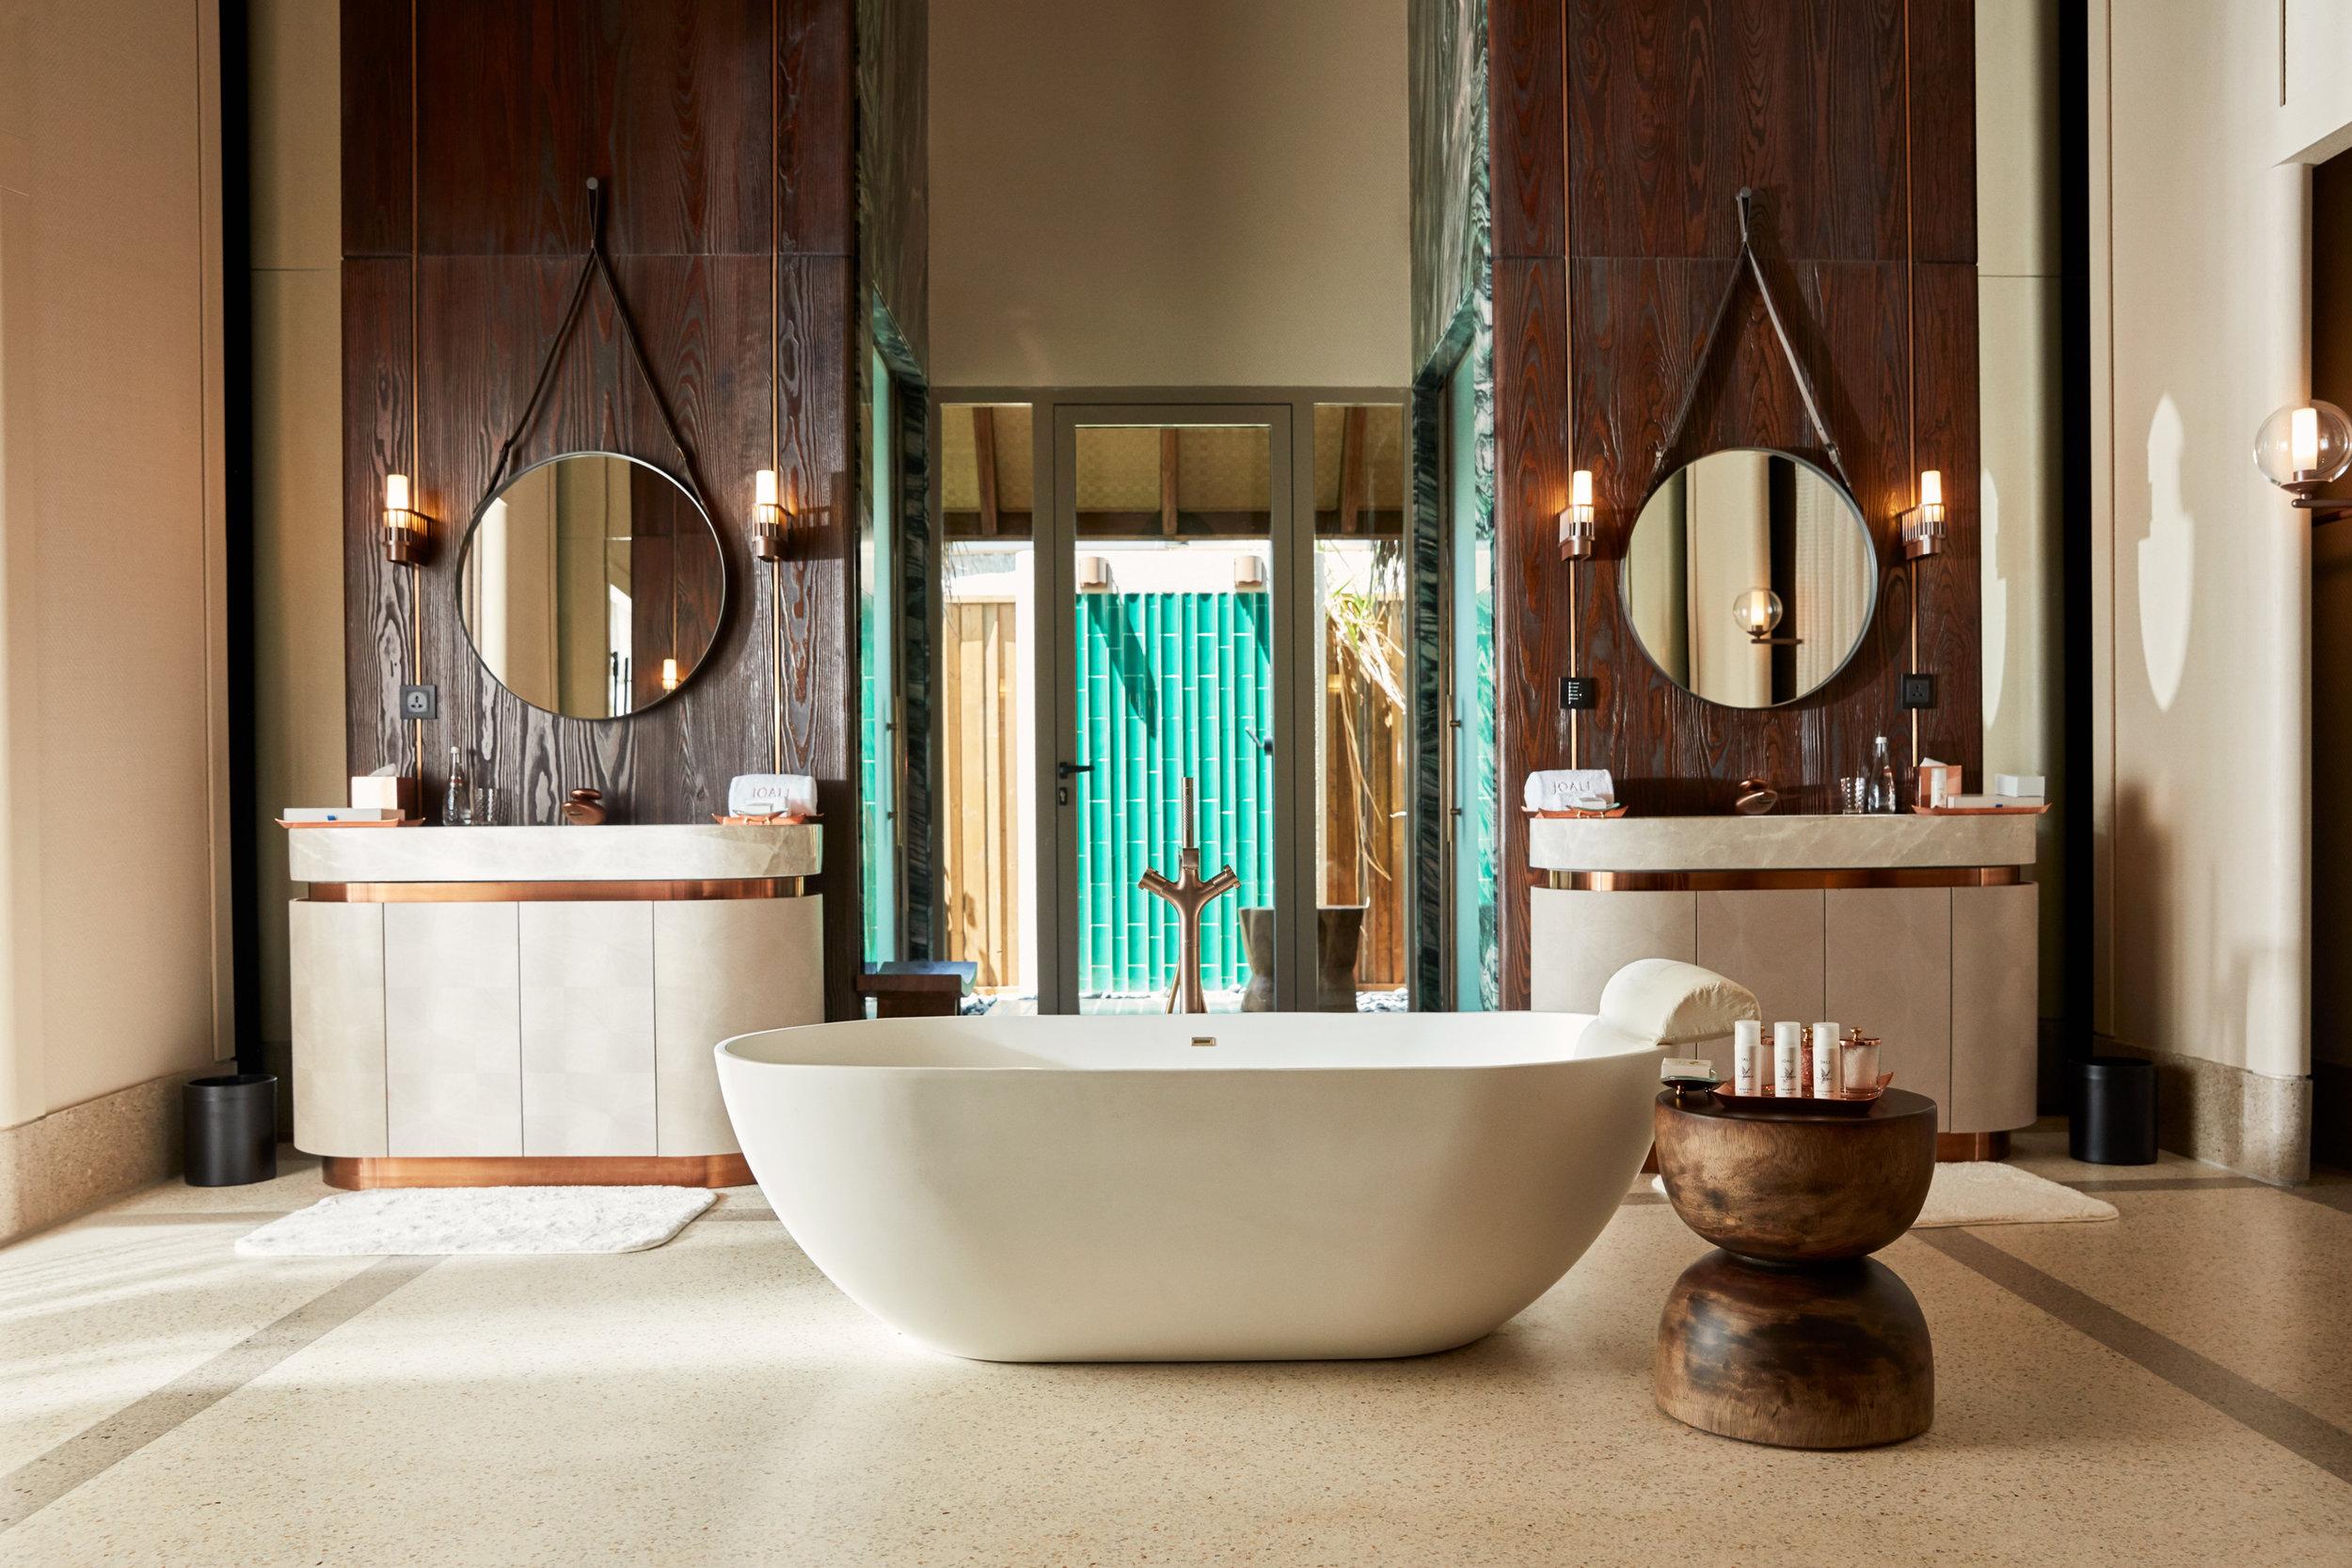 Luxury Water VIlla with Pool_Bathroom area.jpg